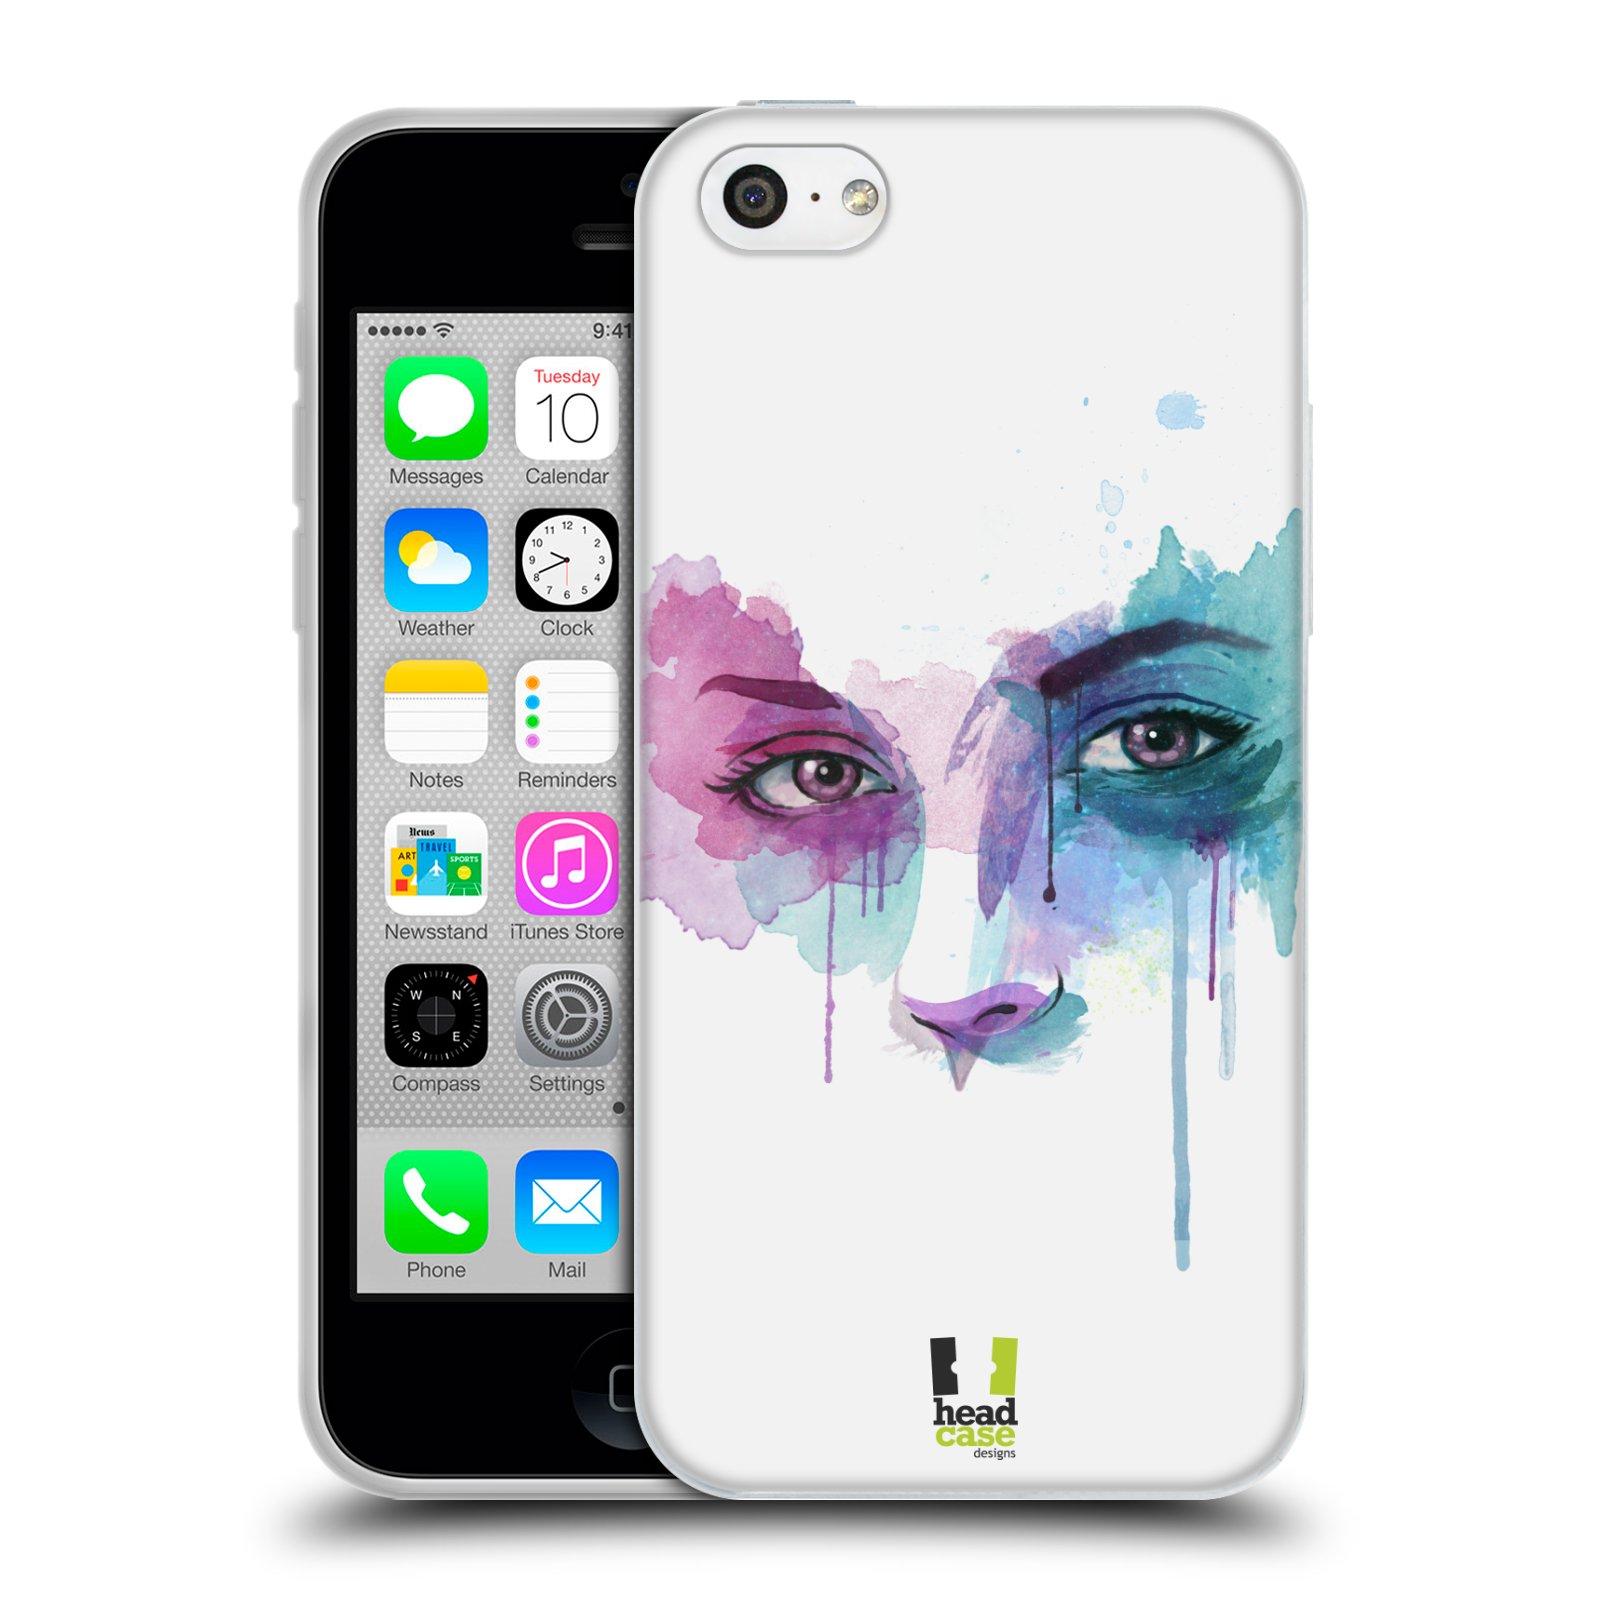 HEAD CASE silikonový obal na mobil Apple Iphone 5C vzor Tvaře vodní barvy  NOVÝ POHLED 5bb44928a19